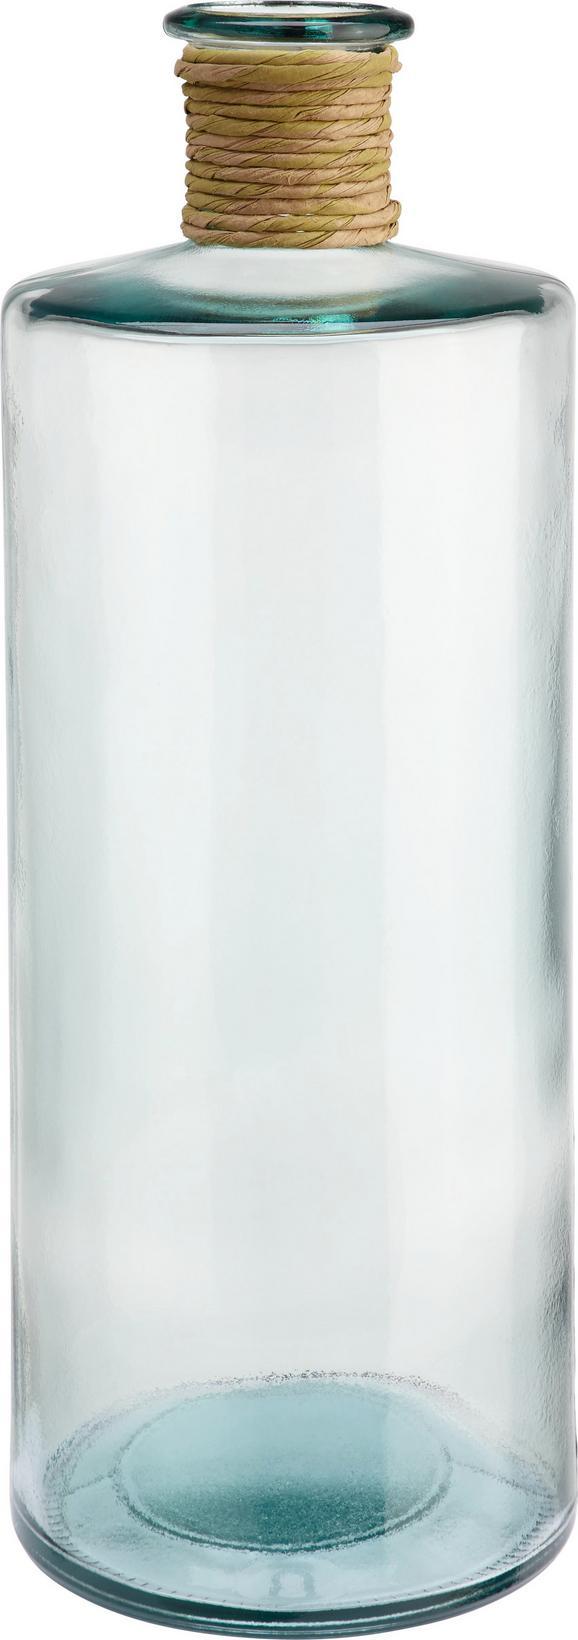 Vase Klara aus Glas - Klar, Glas/Weitere Naturmaterialien (40cm) - MÖMAX modern living